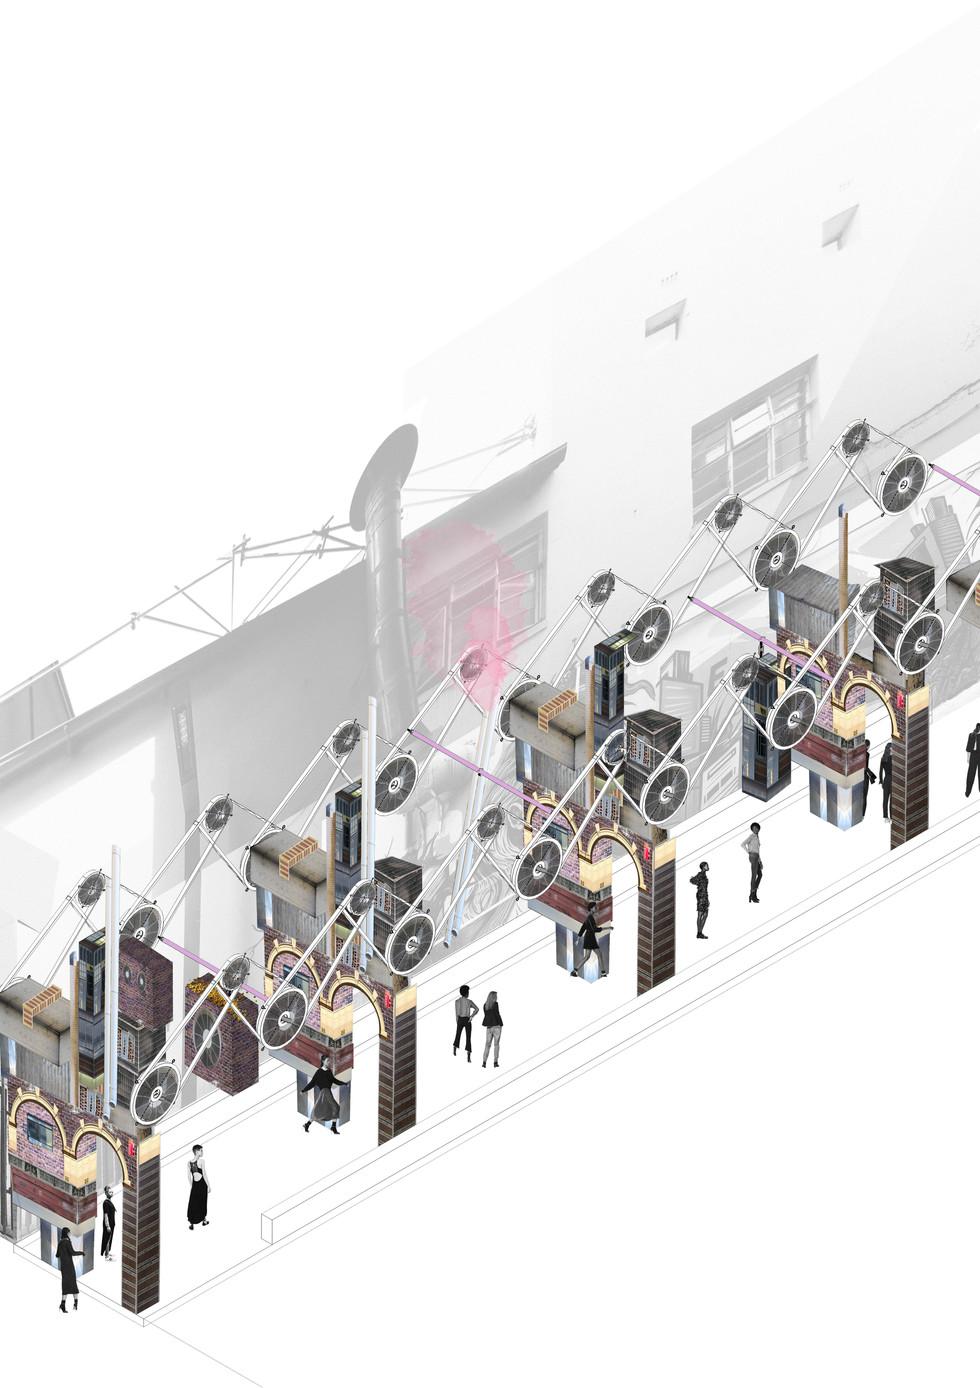 Corridors of Hyper Consumption. Lubinsky, T. Unit 11. 2017